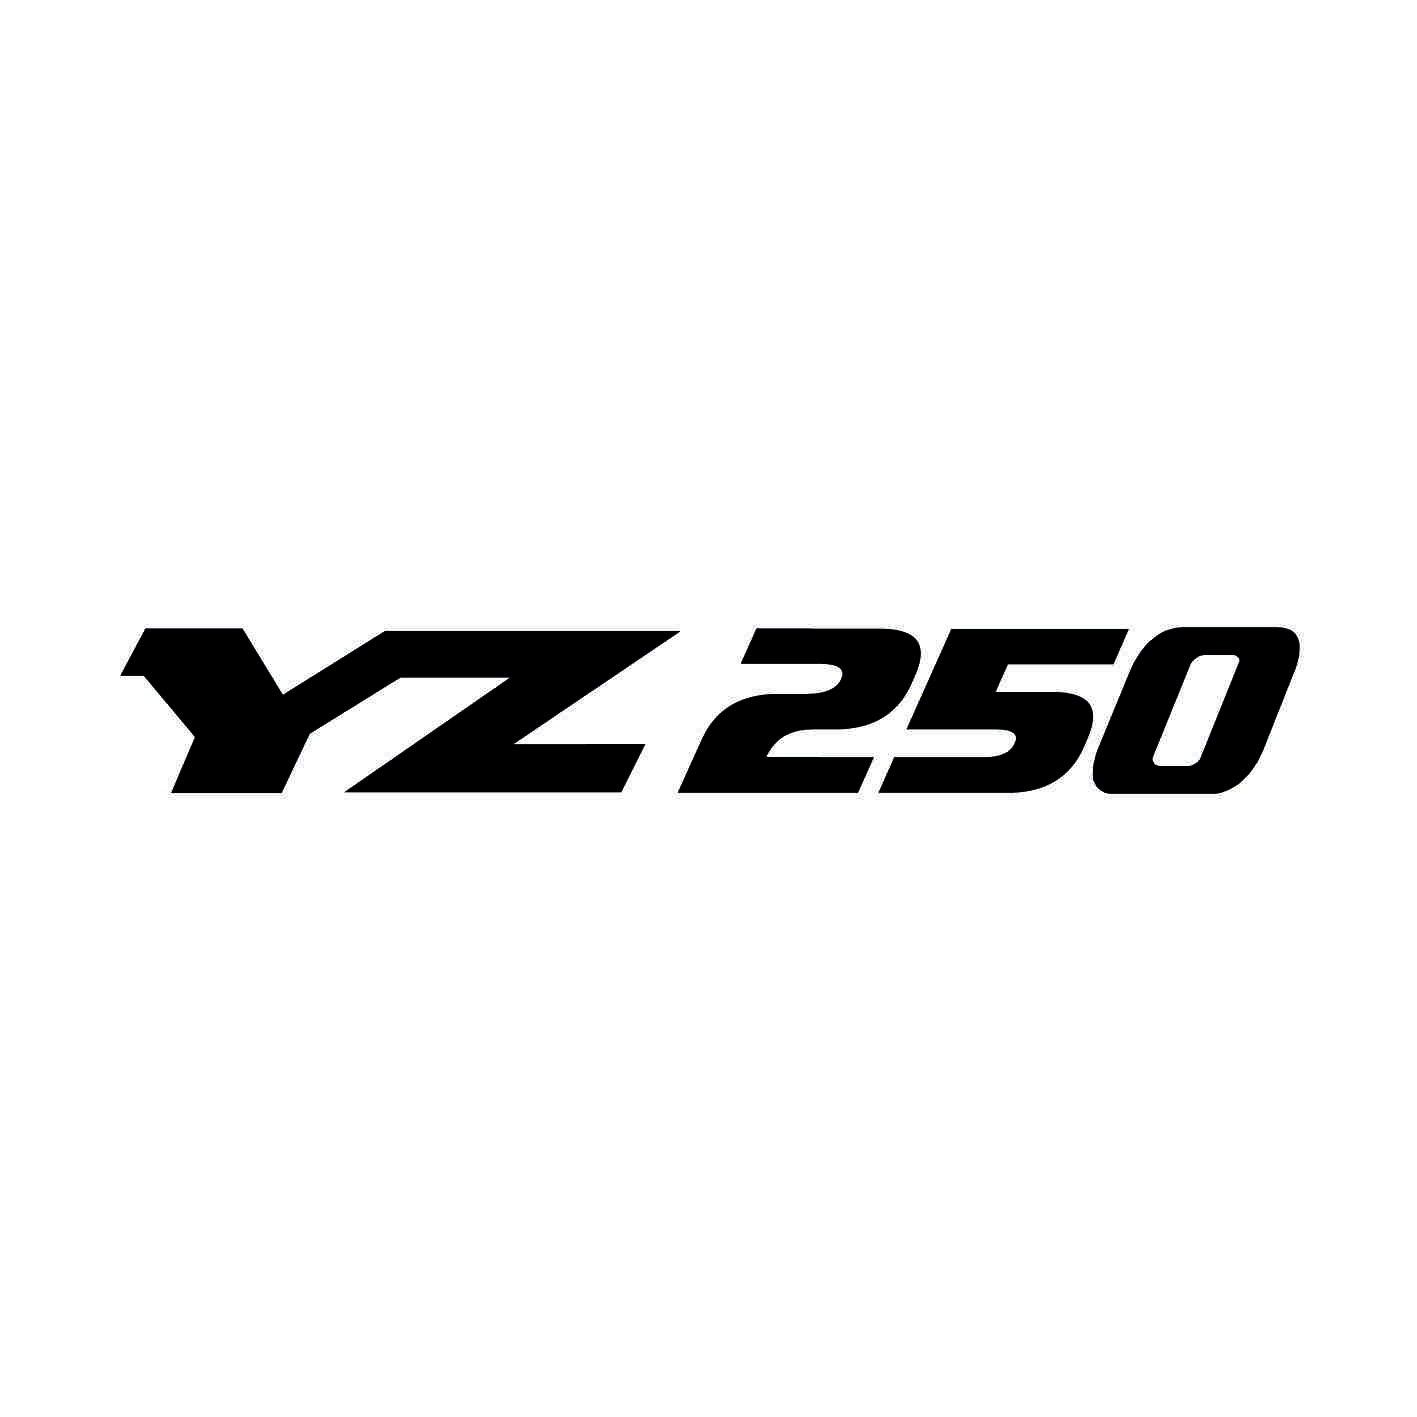 yamaha-ref61-yz-255-stickers-moto-casque-scooter-sticker-autocollant-adhesifs